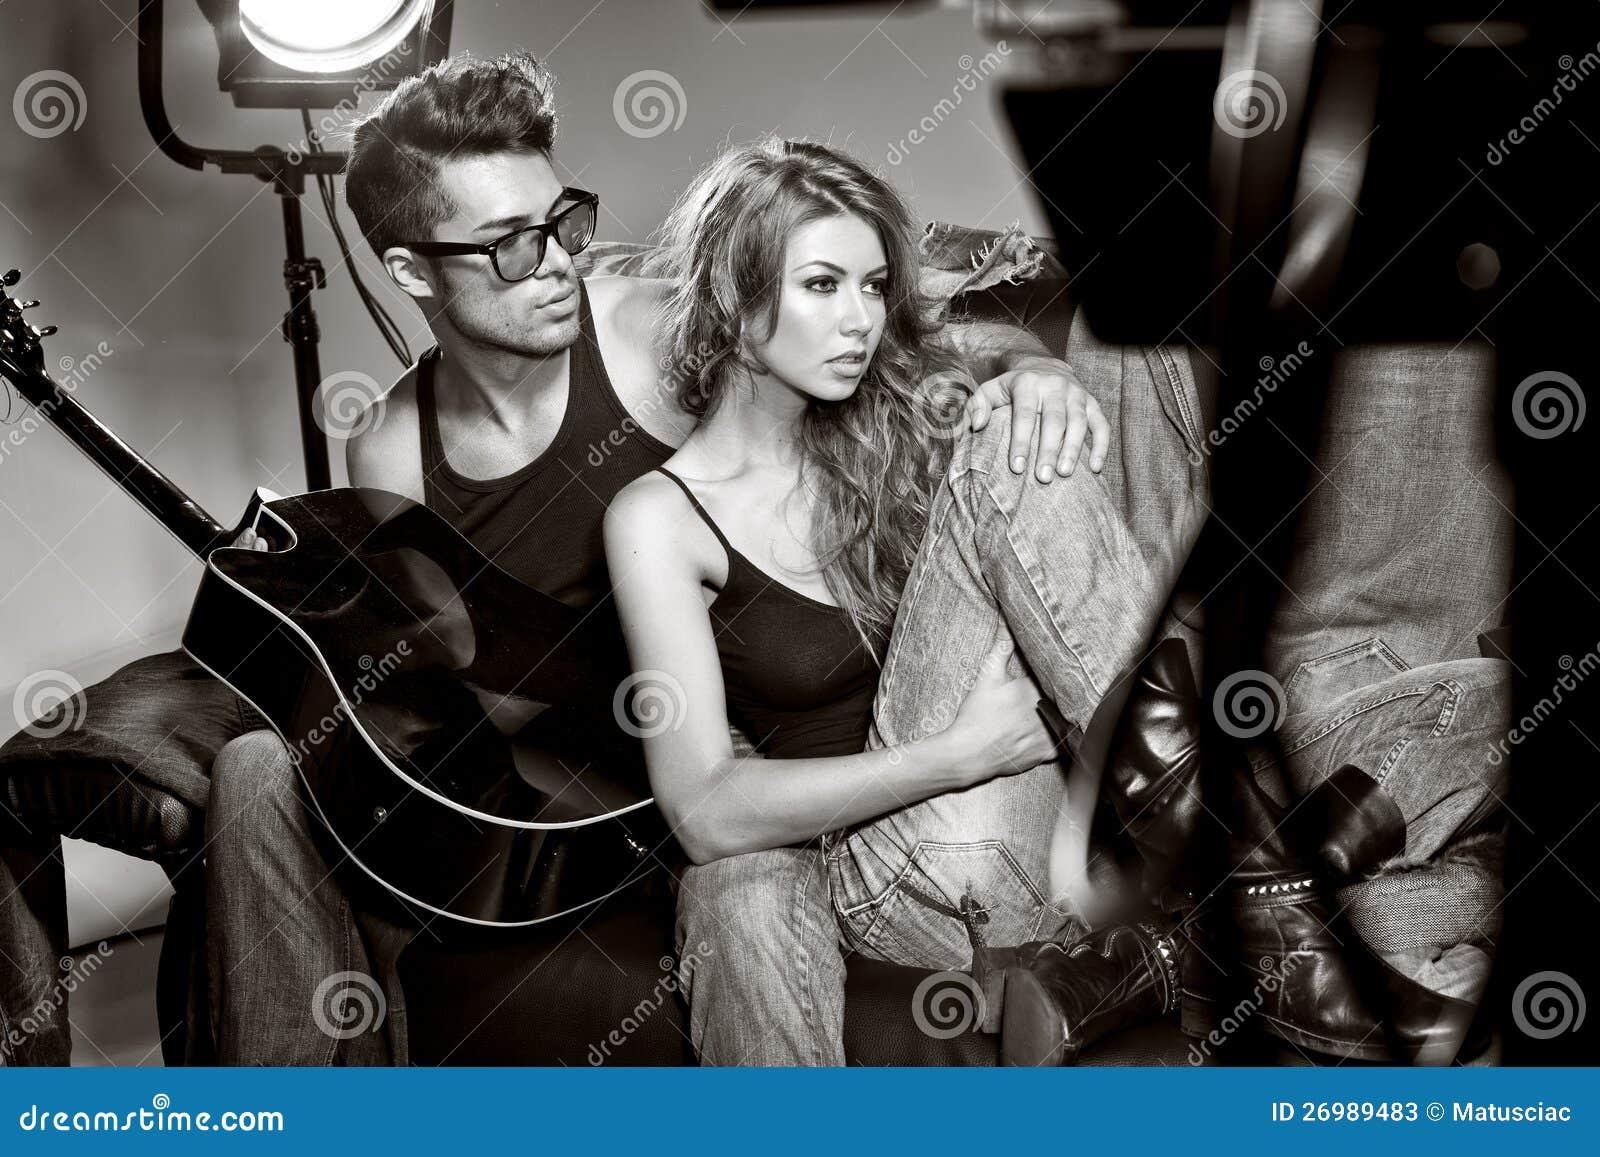 Stock Photos  Sexy Man And Woman Doing A Fashion Photo Shoot